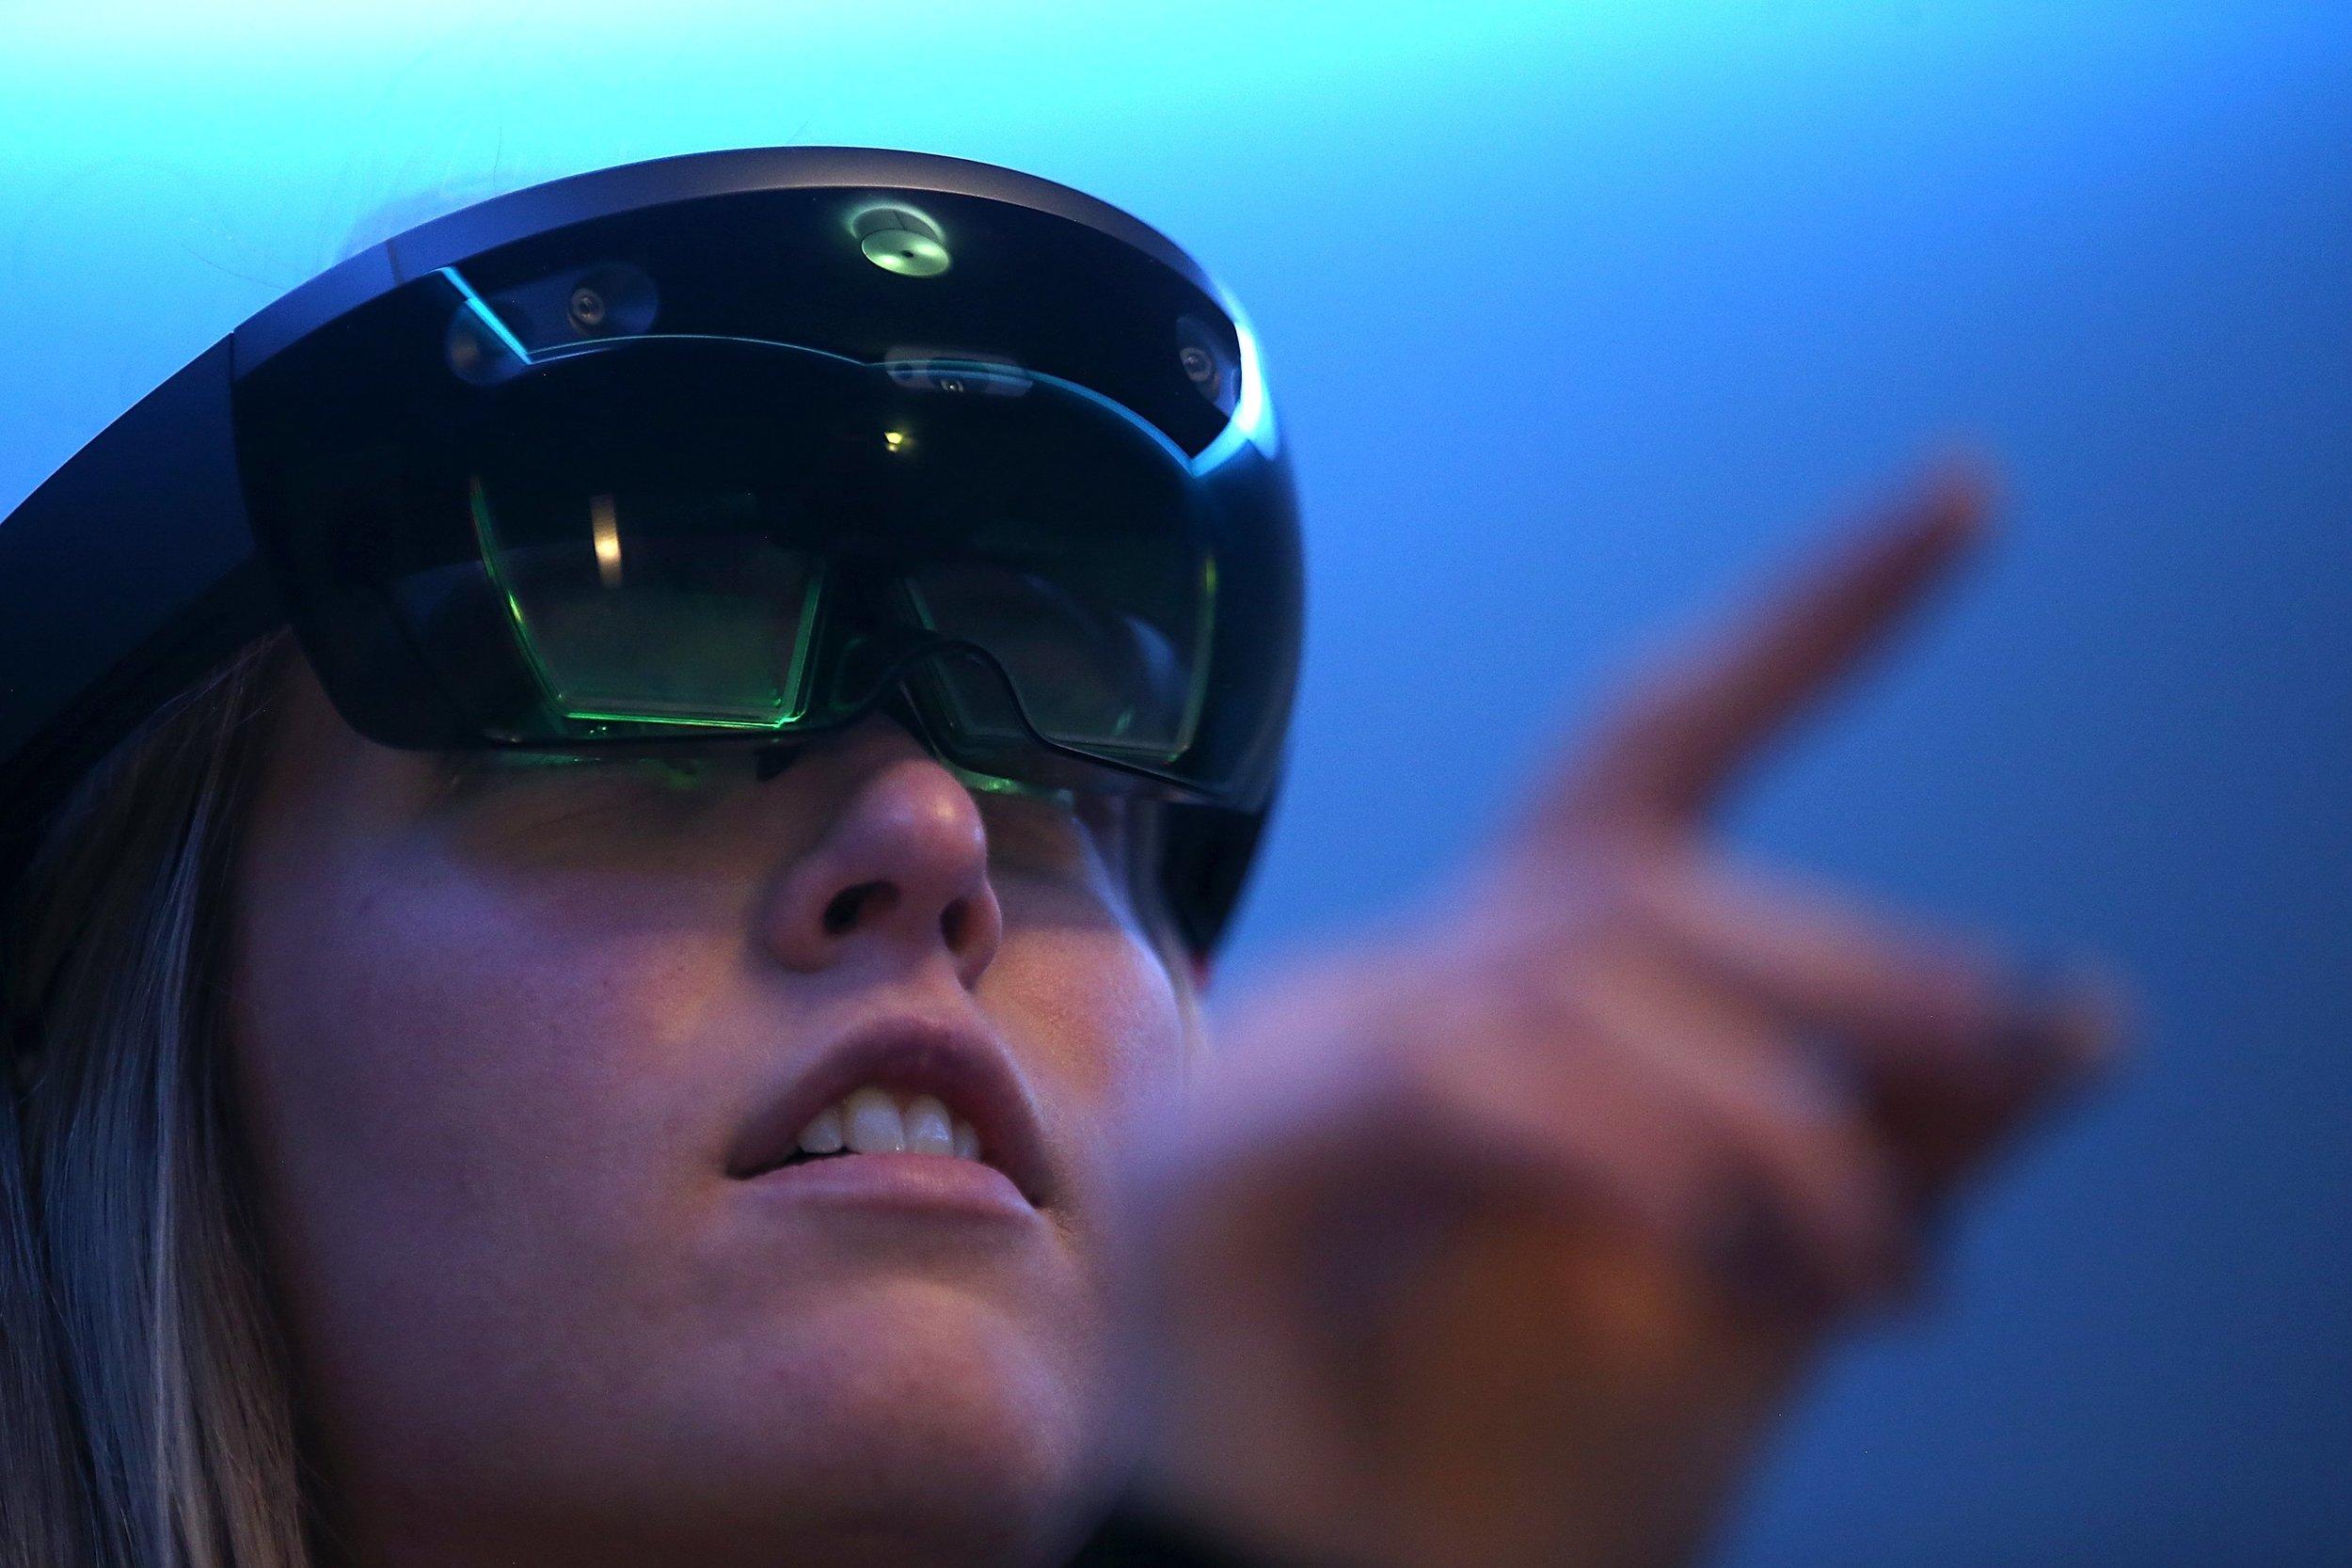 Hololens close-up optics. Image credits  TIME